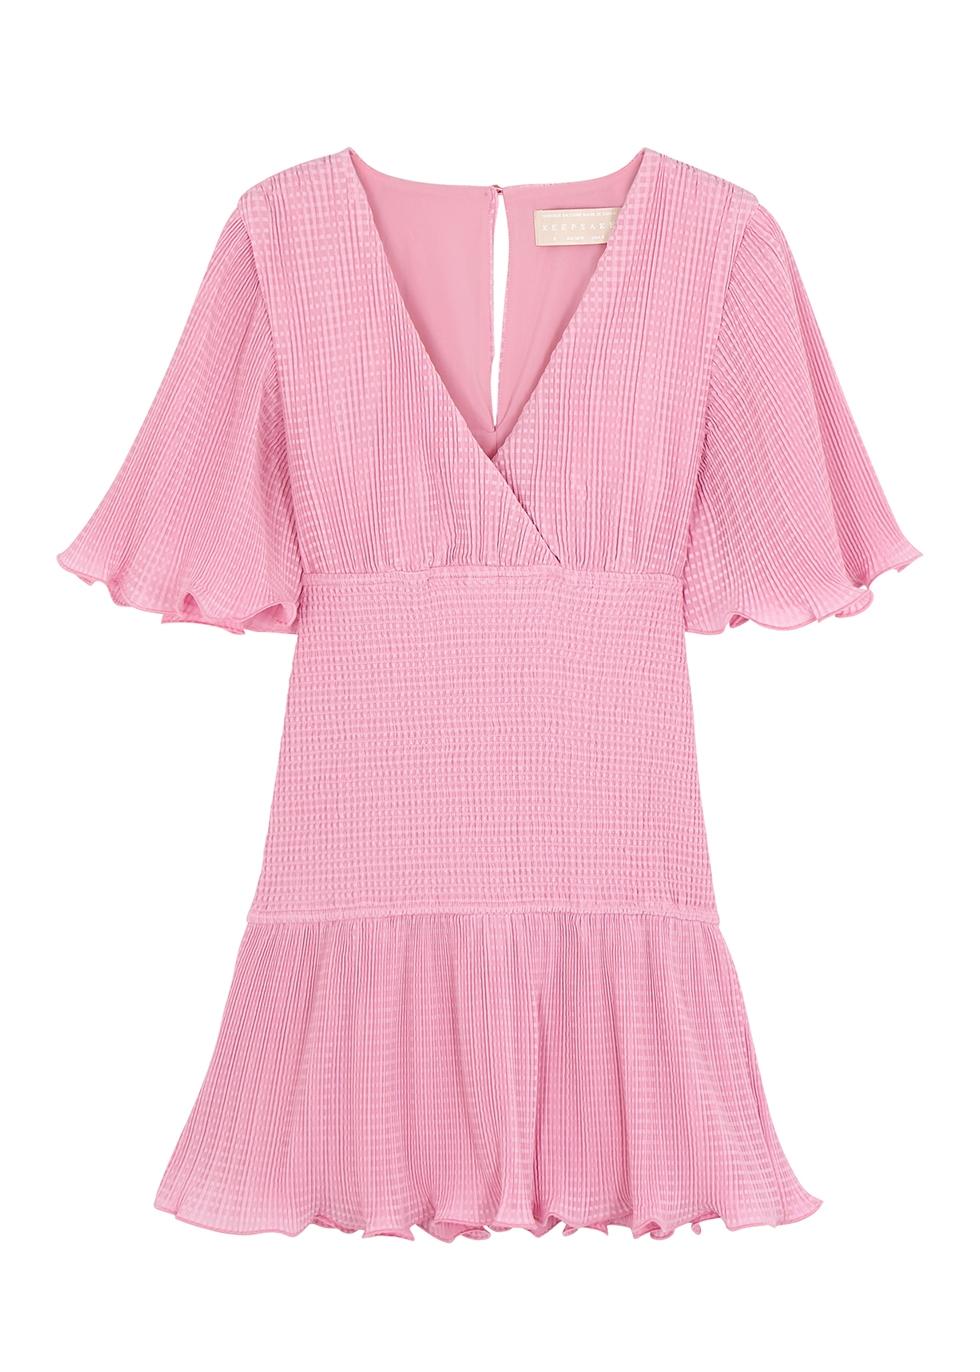 035b9069a29 Women s Designer Clothing